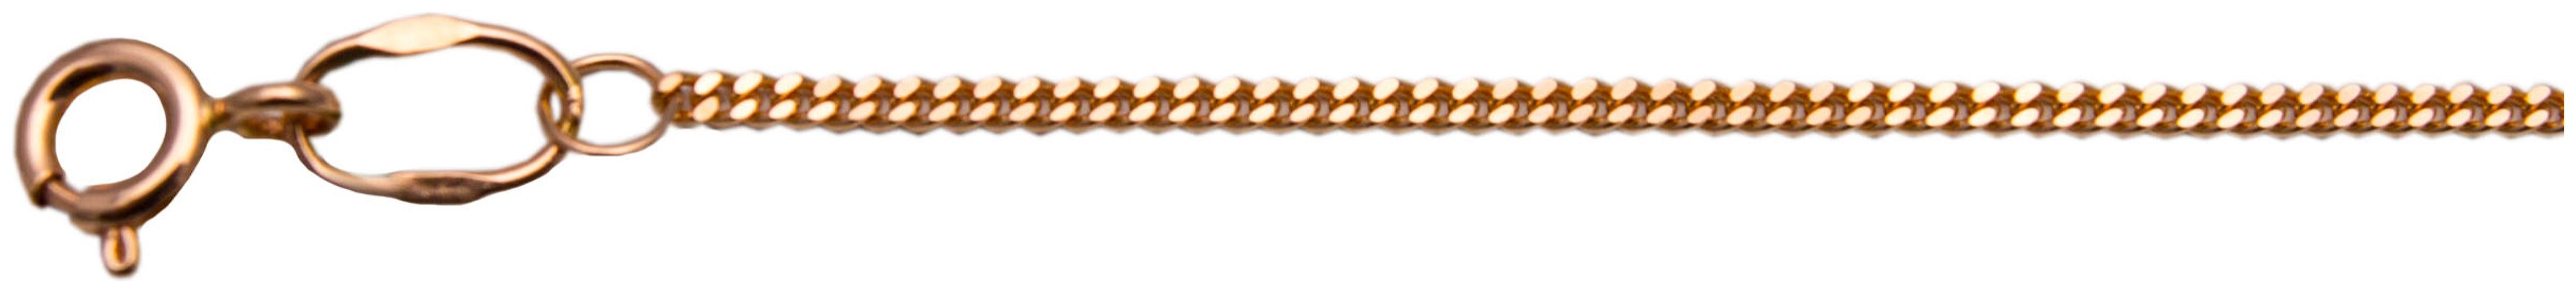 картинка цепь из золота 585° ЦП140А2-А51